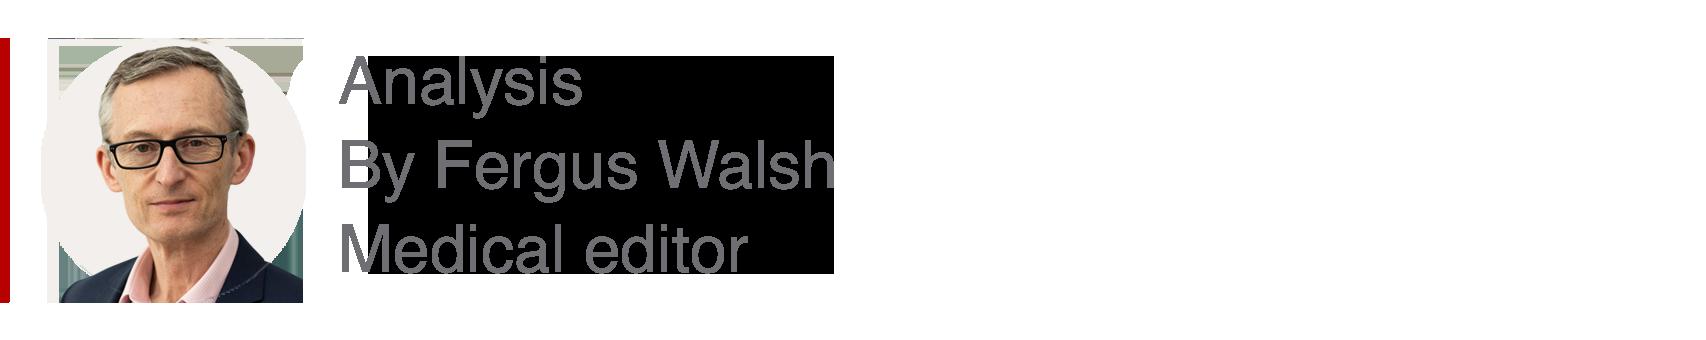 Analysis box by Fergus Walsh, medical editor